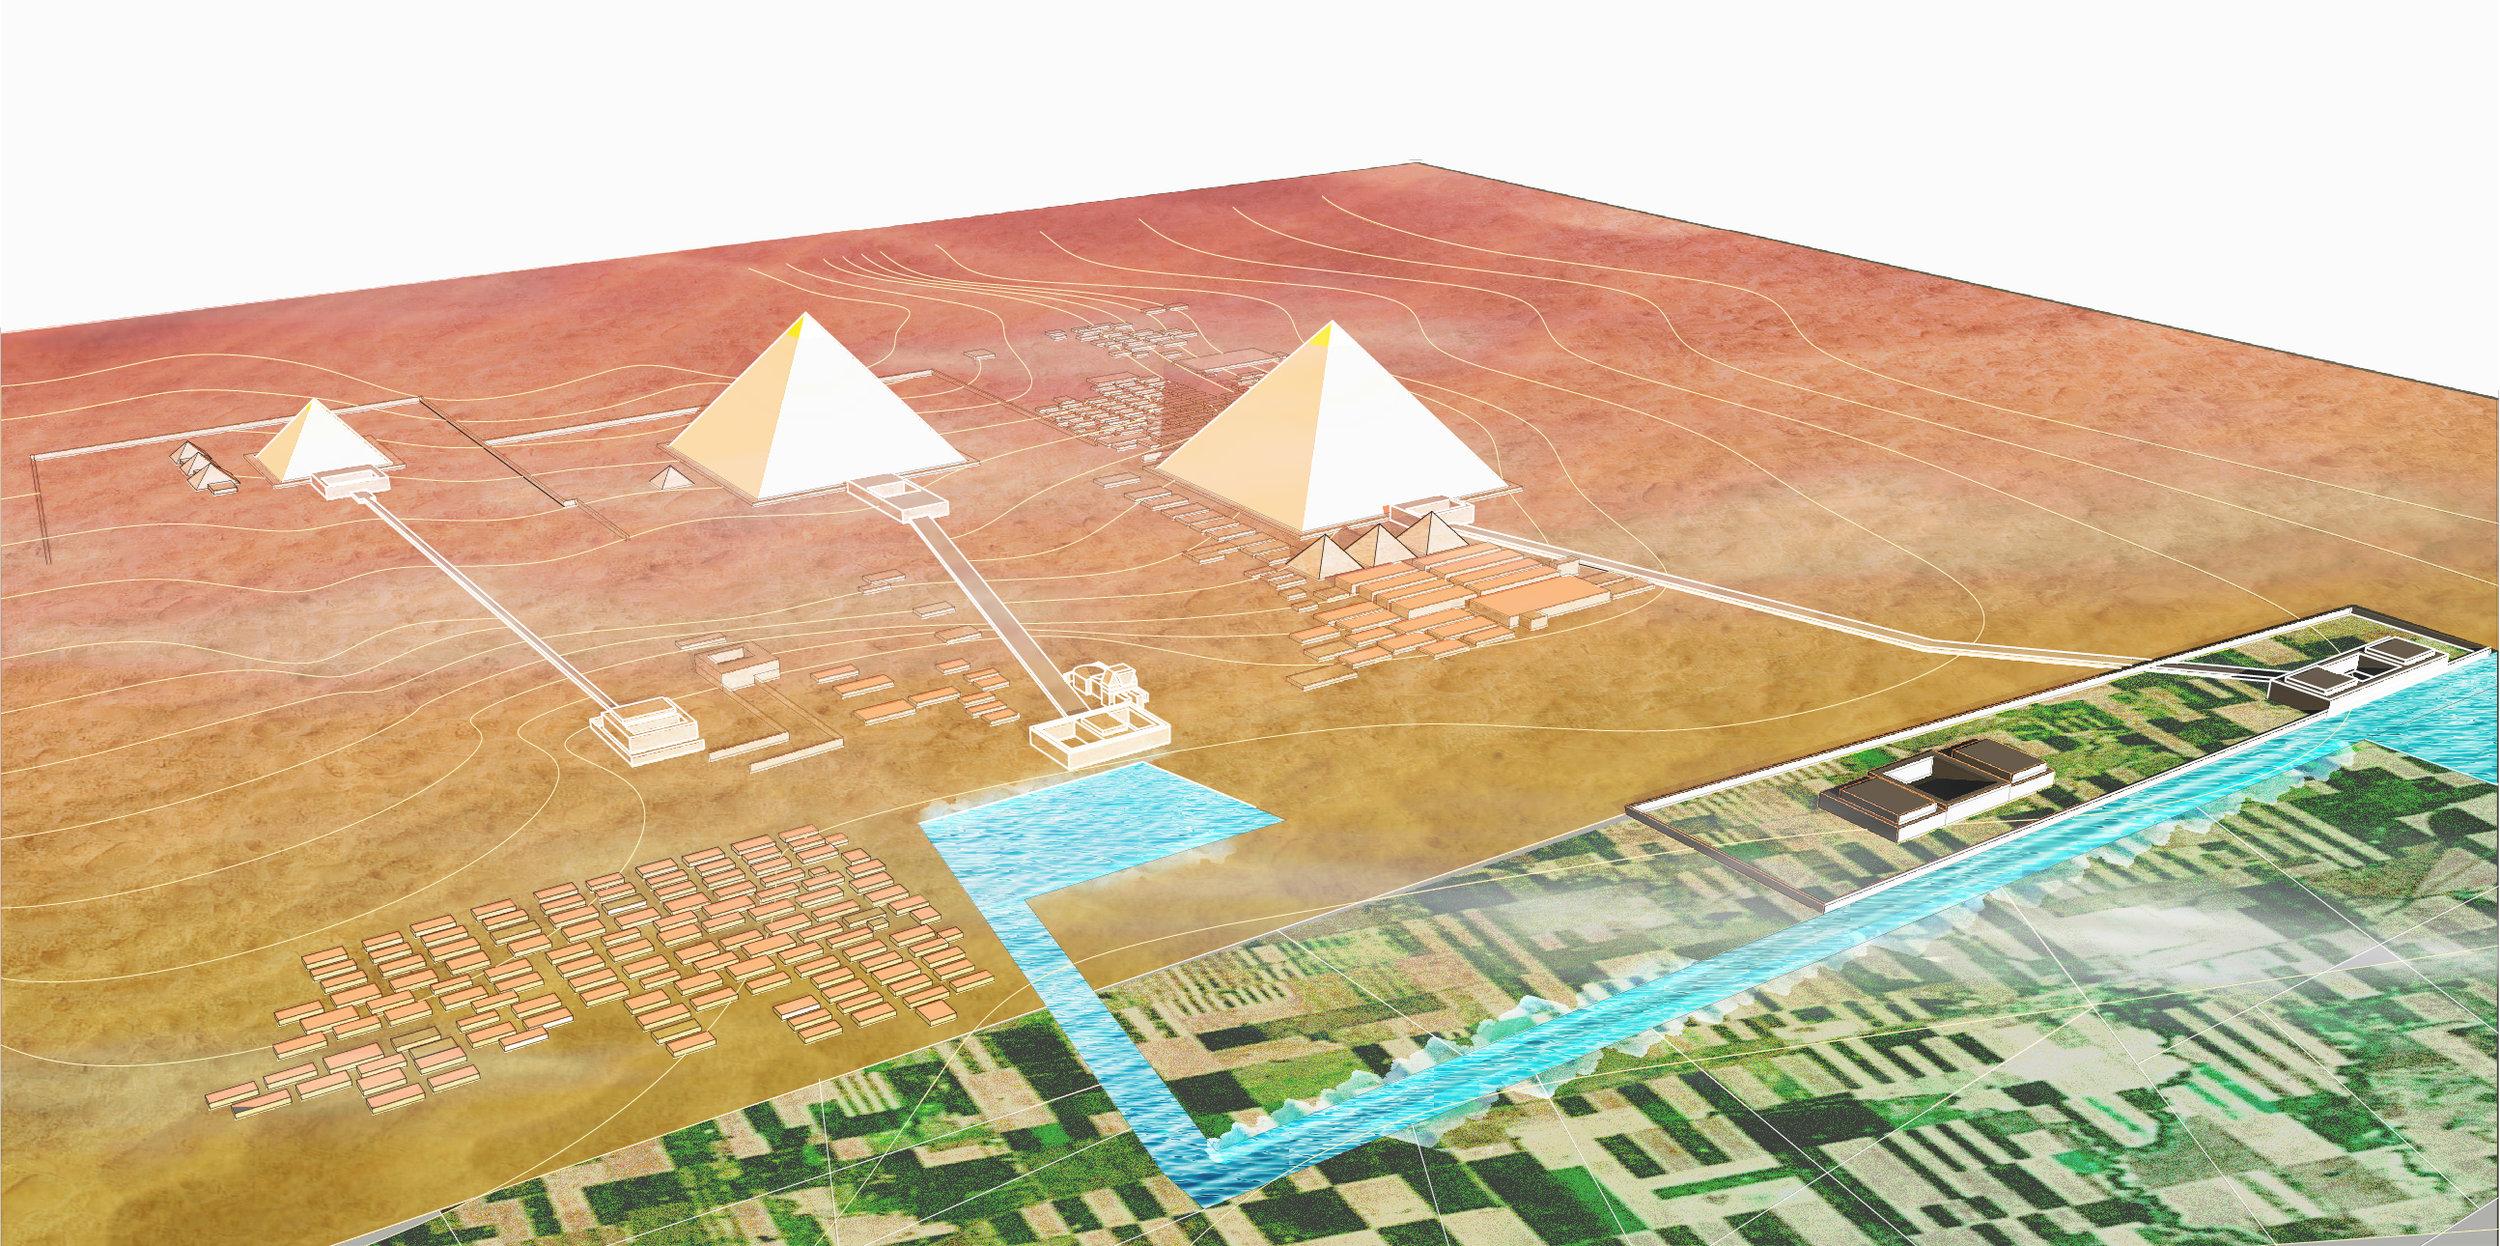 GIZA NECROPOLI: ca. 2500 BCE